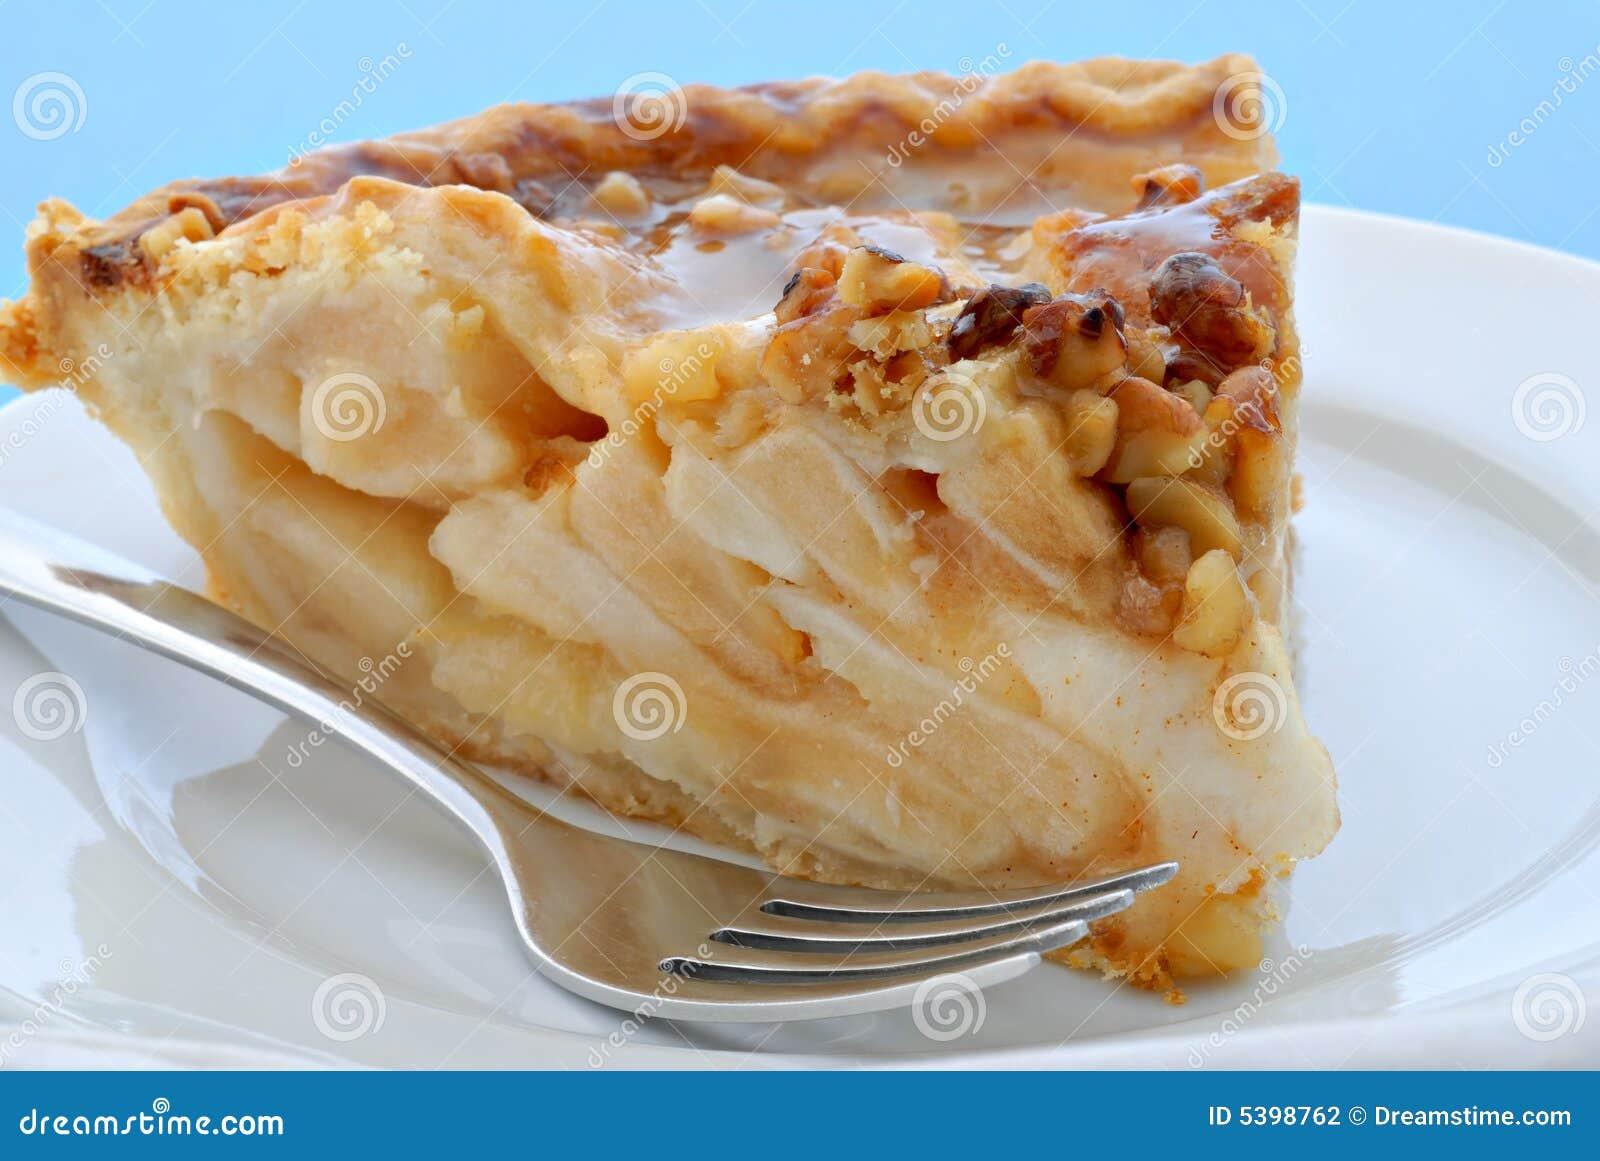 Caramel Walnut Pie Stock Photography - Image: 5398762